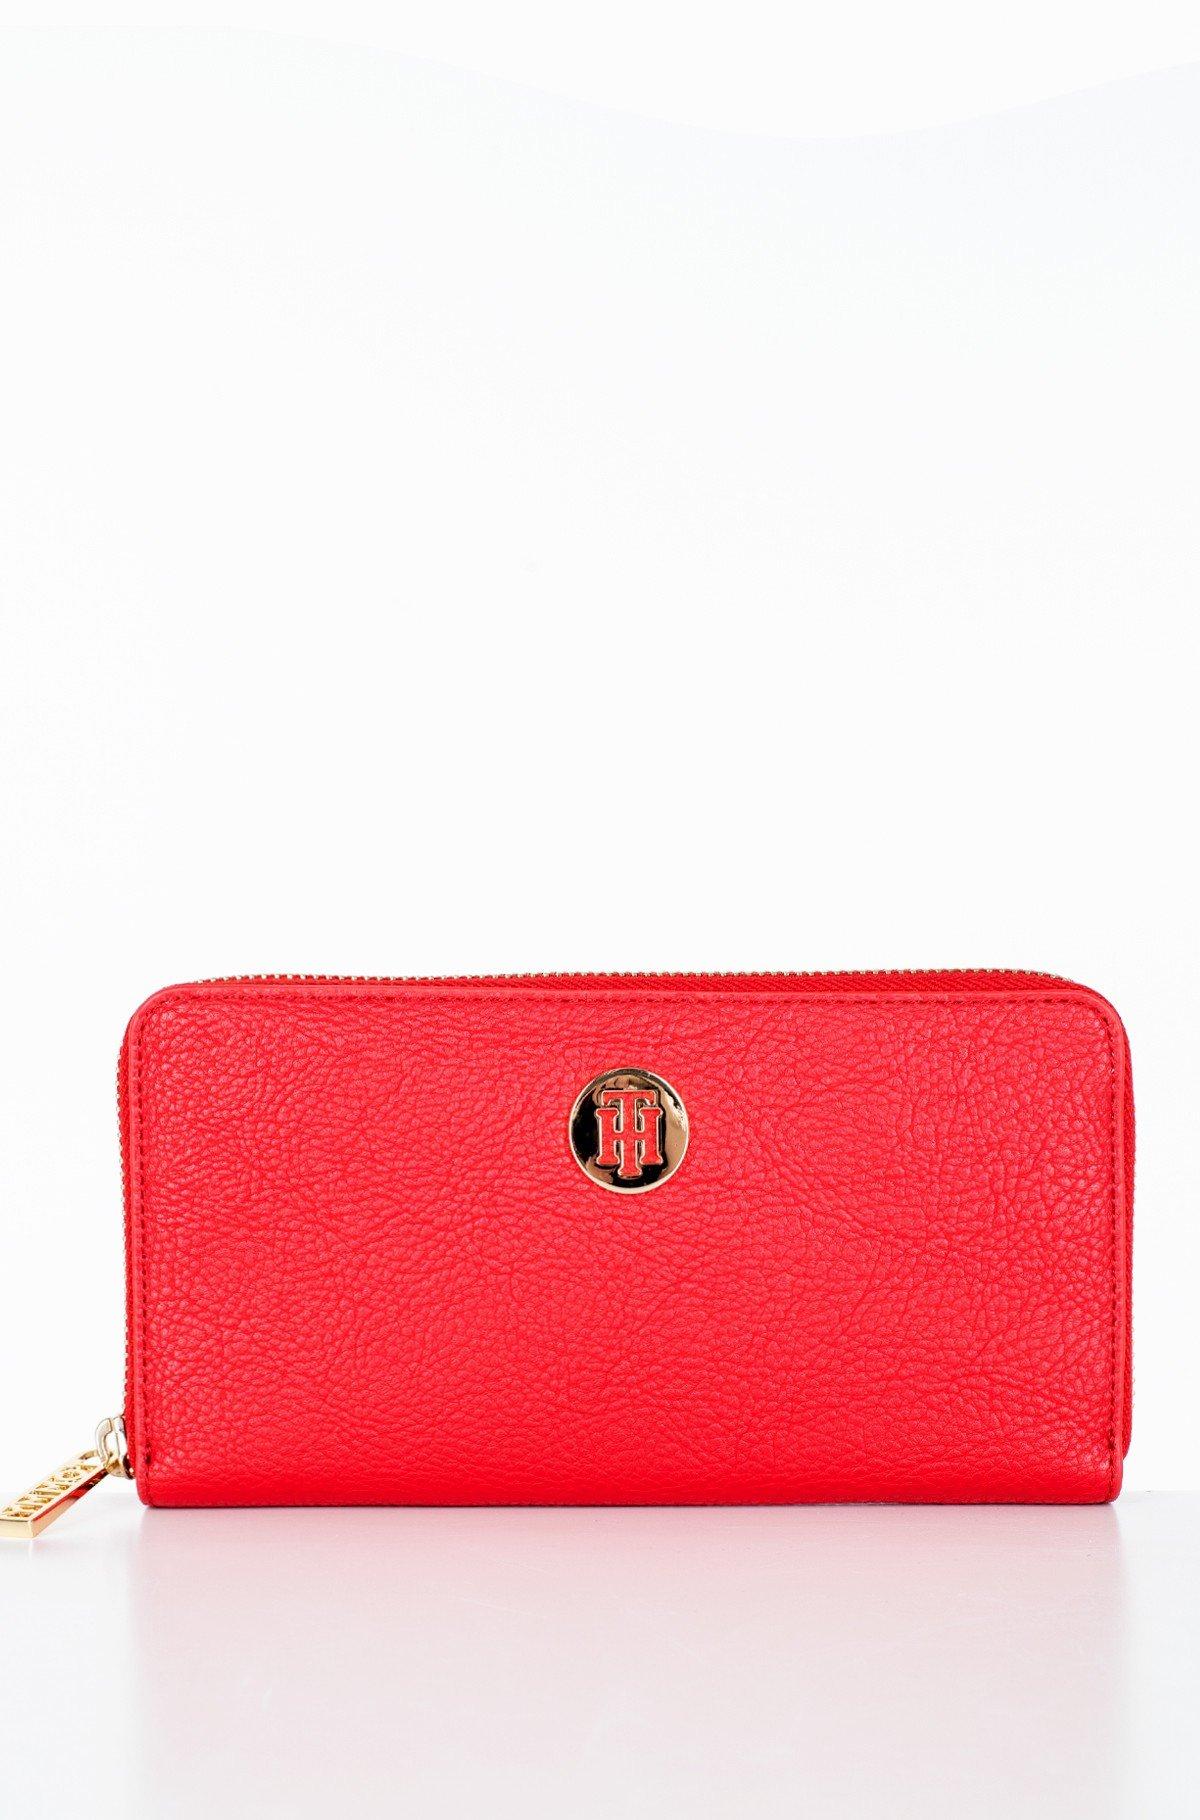 Wallet TH CORE LARGE ZA-full-1